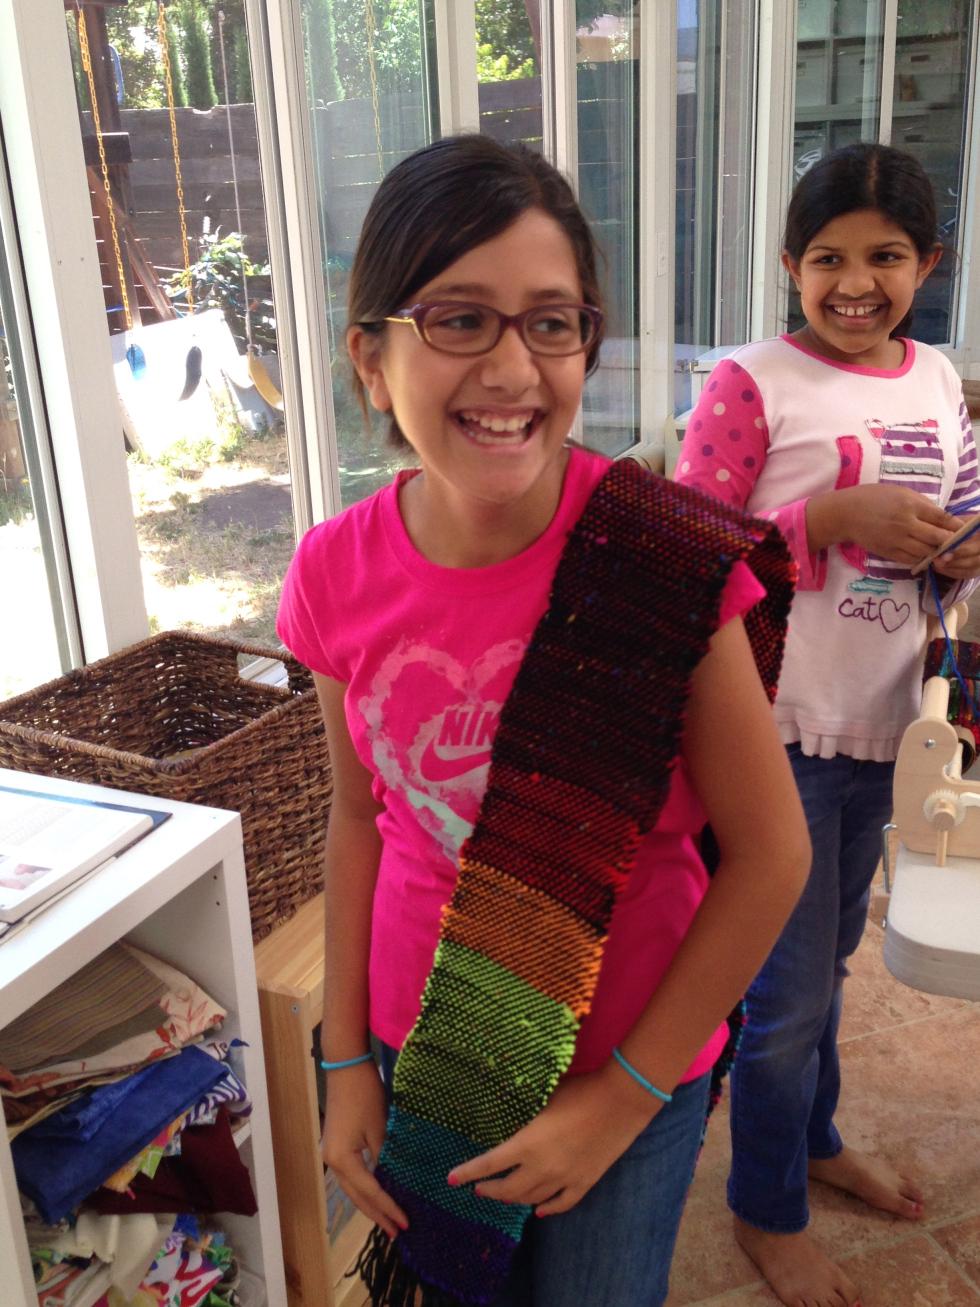 5th grader Beautiful scarf finish